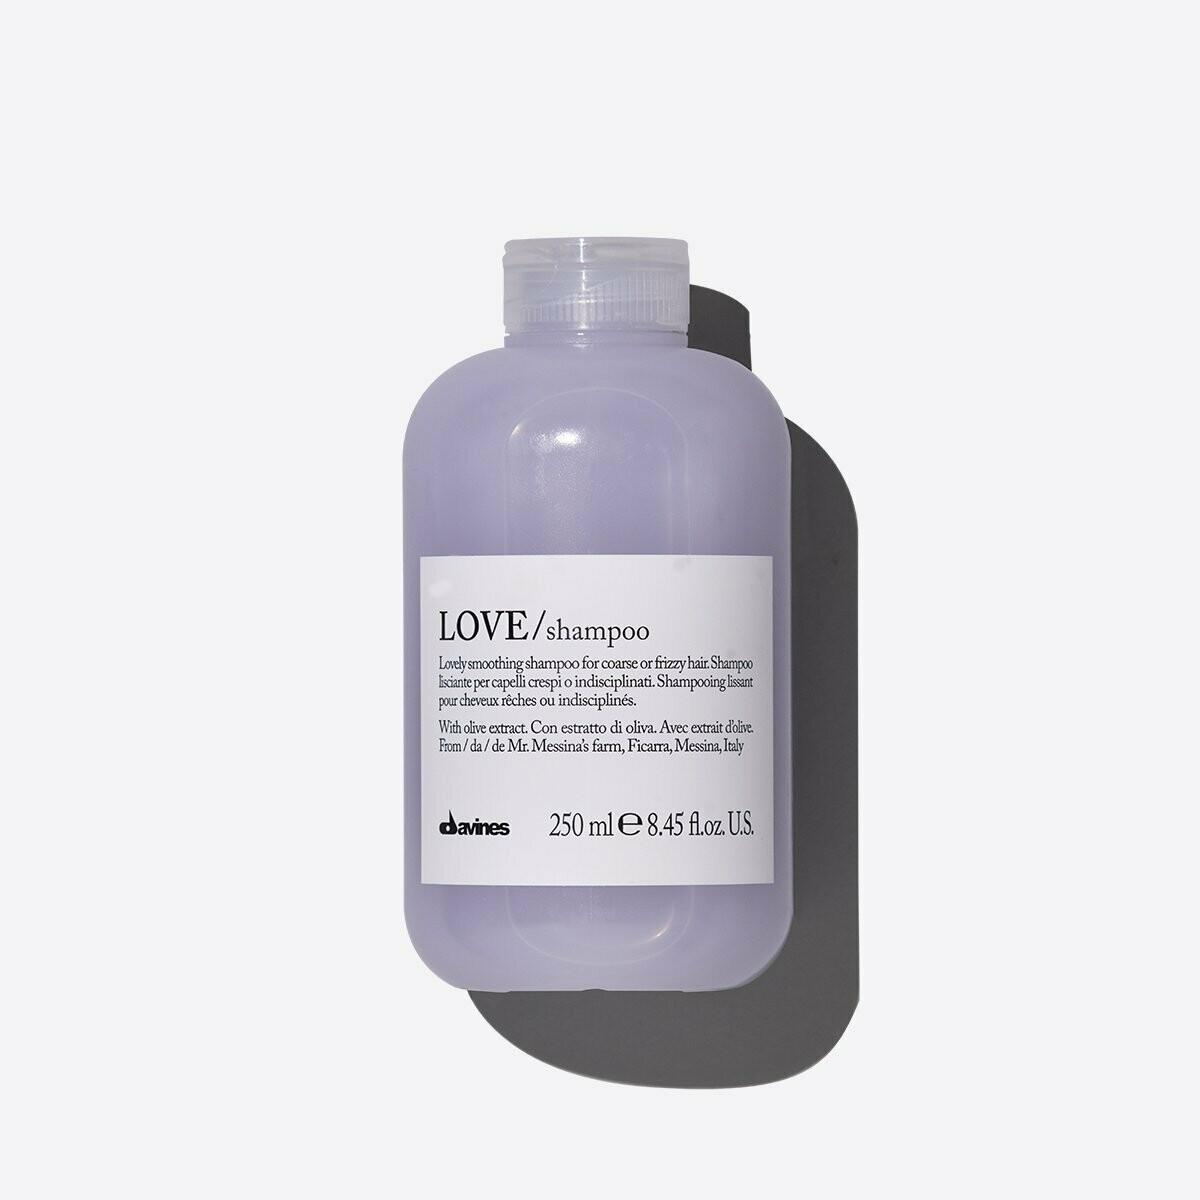 LOVE Shampoo 250